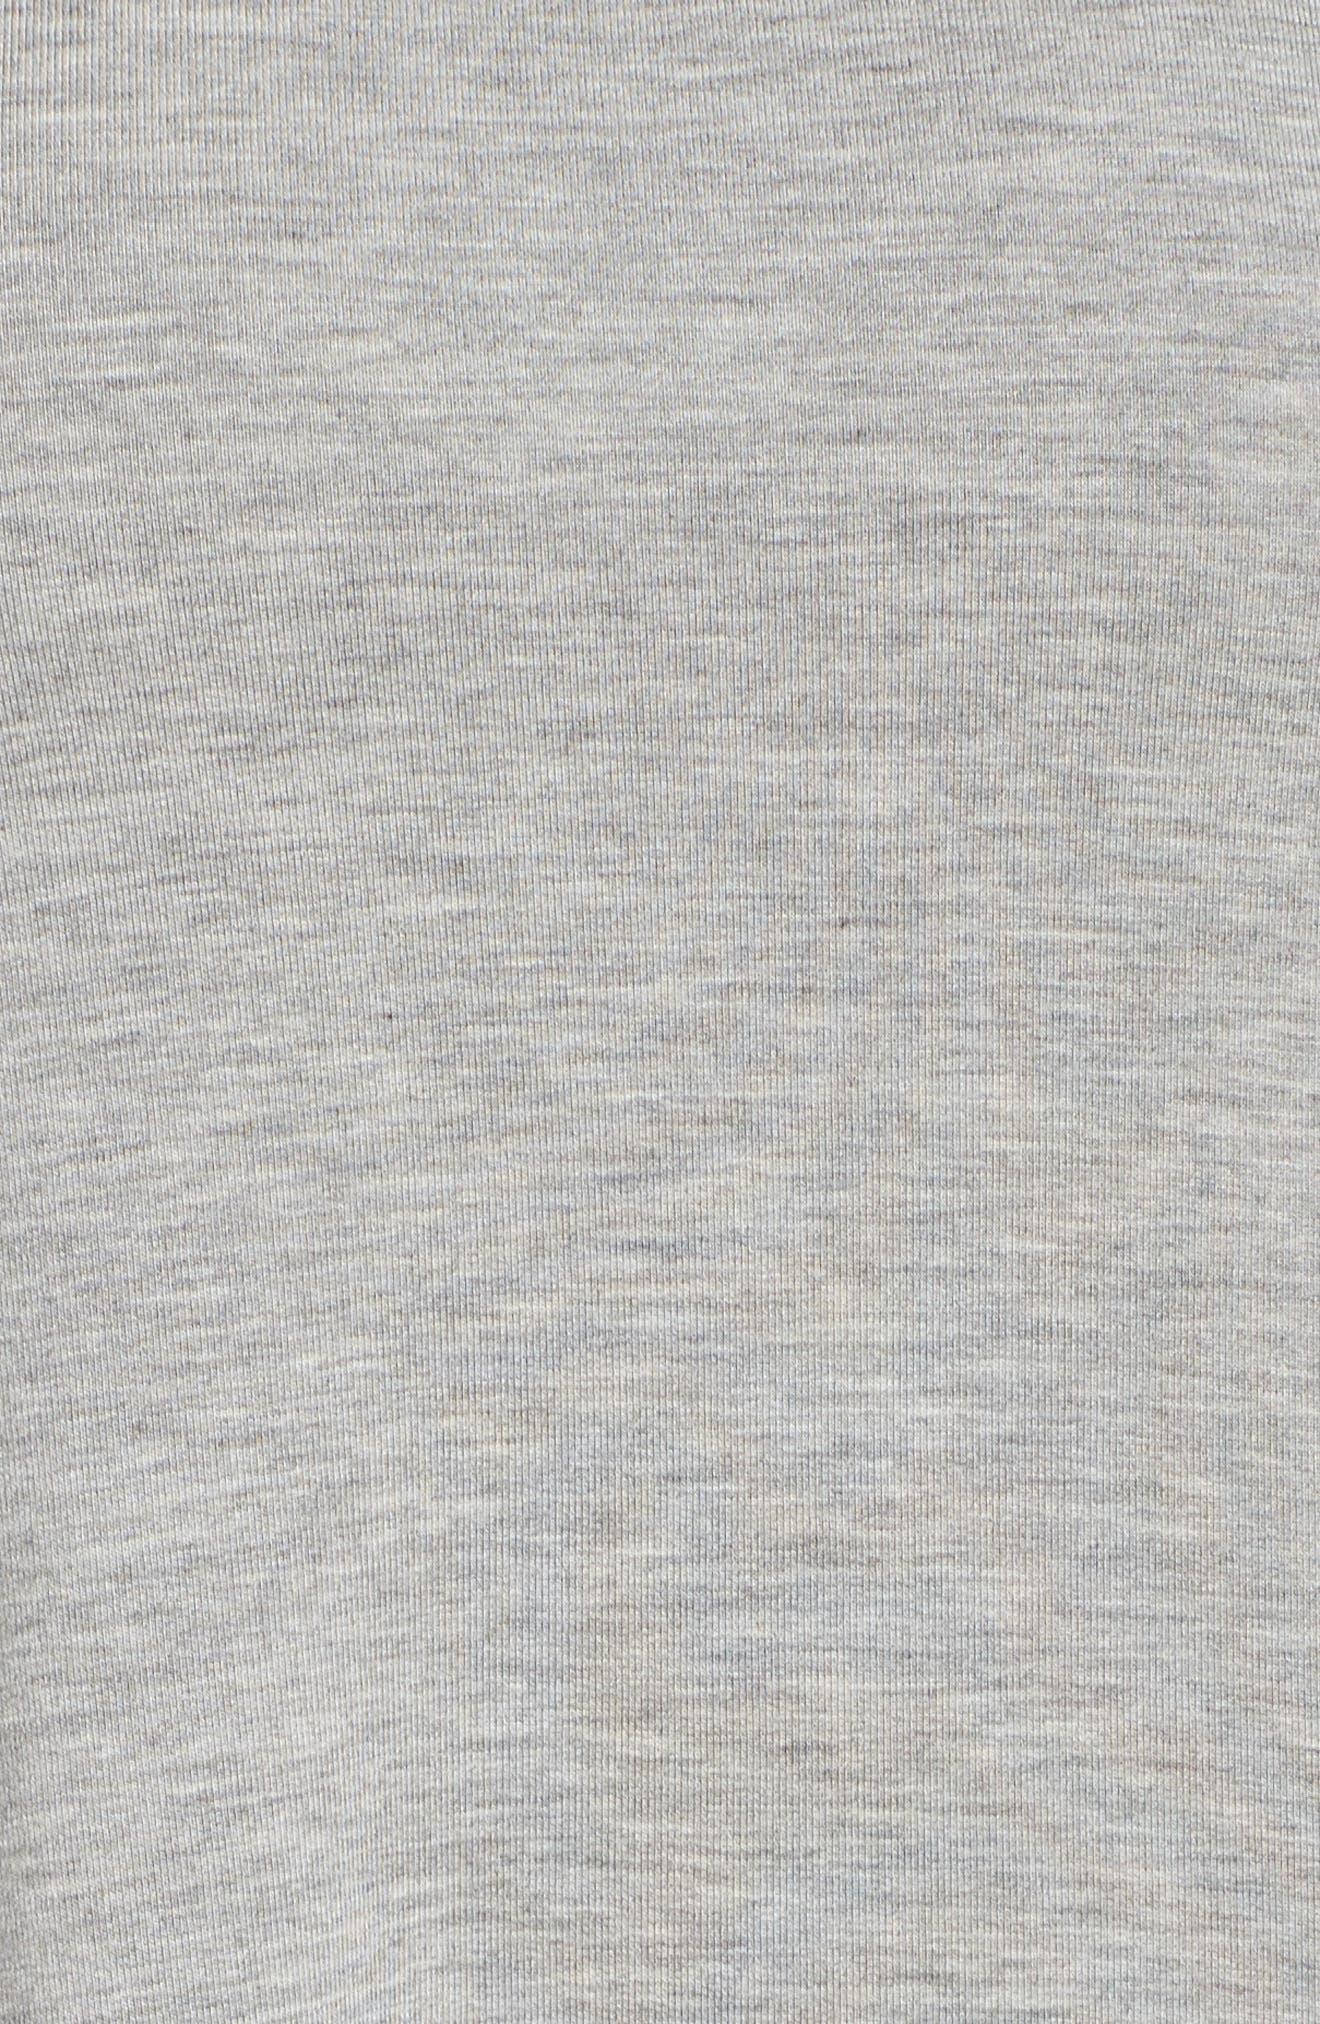 Greer Knit Shift Dress,                             Alternate thumbnail 5, color,                             050